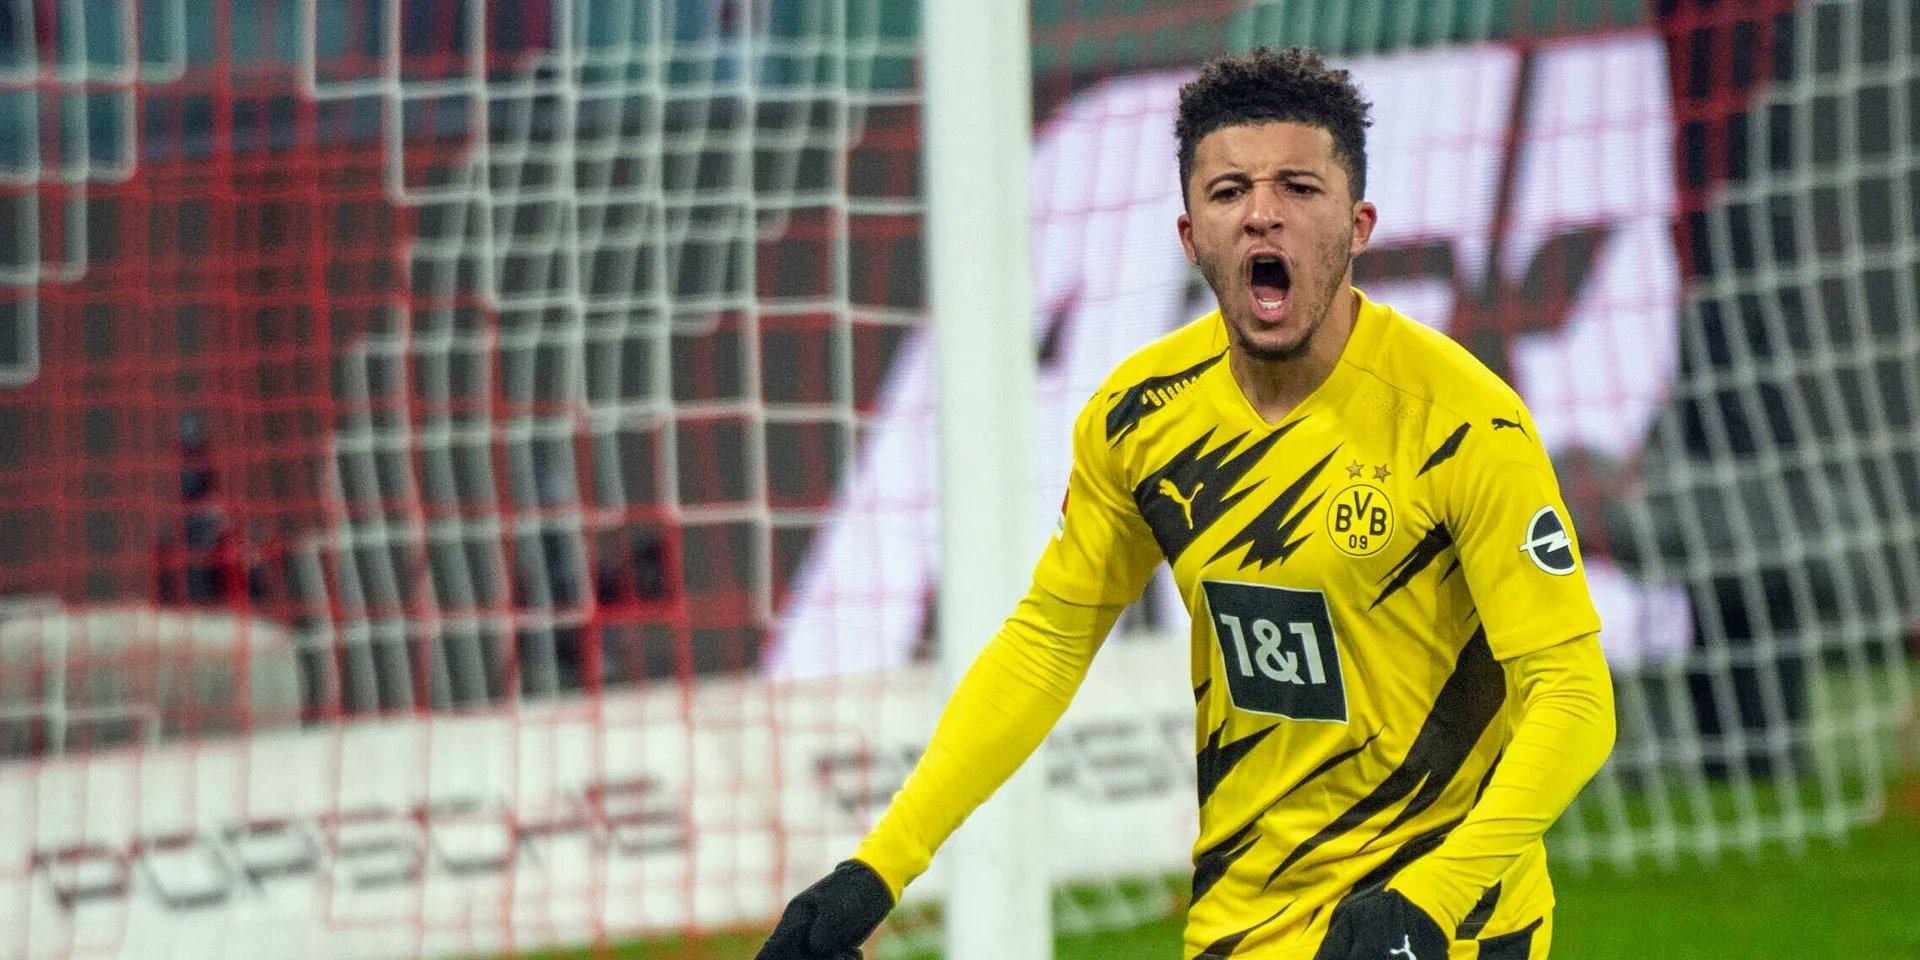 McAteer advises Liverpool to sign versatile €100m Dortmund forward over Mbappe